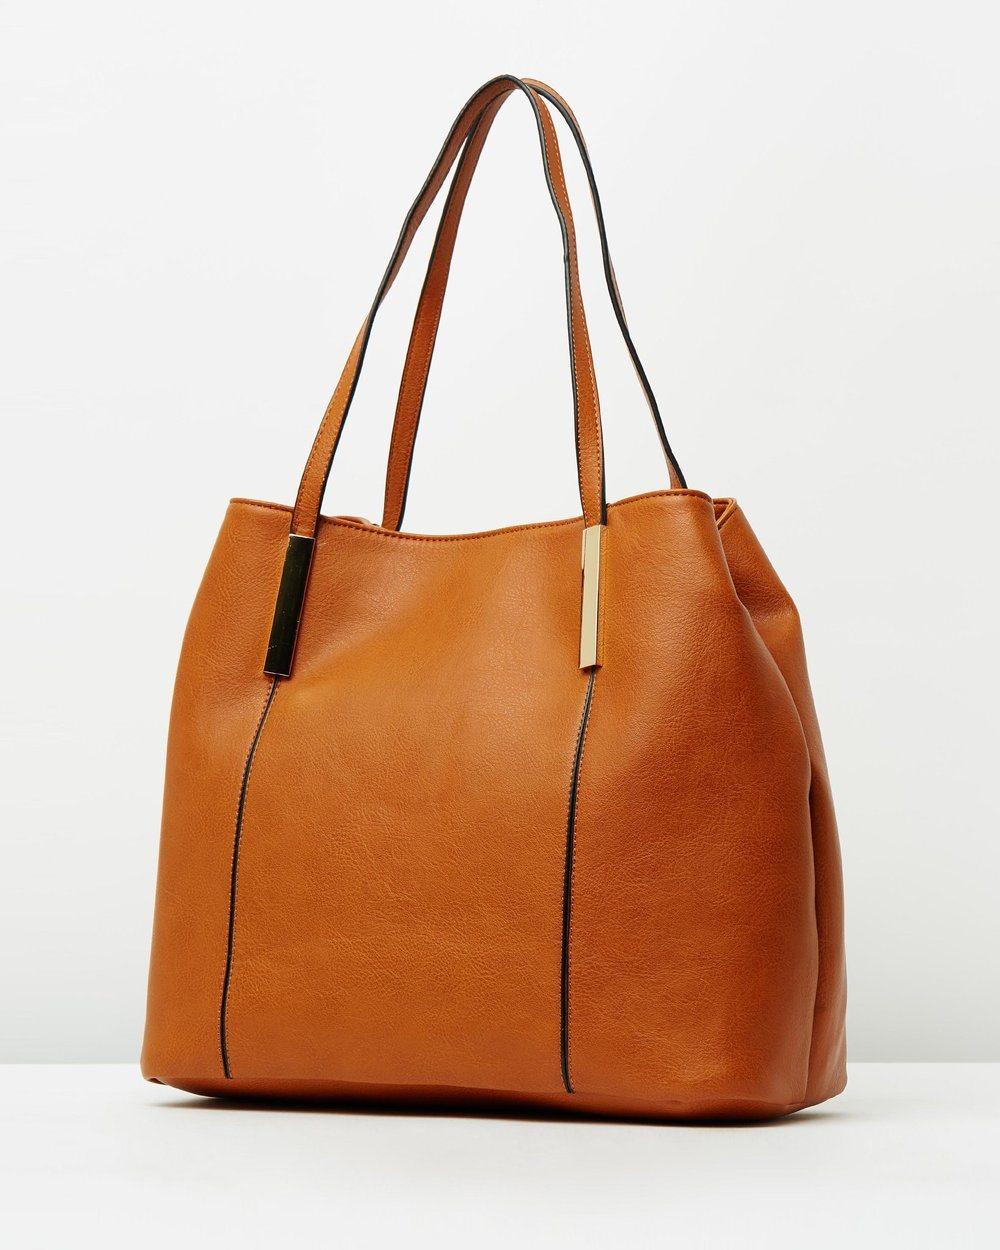 New Trendy PU Women Tote Bag Designer Fashion Handbags